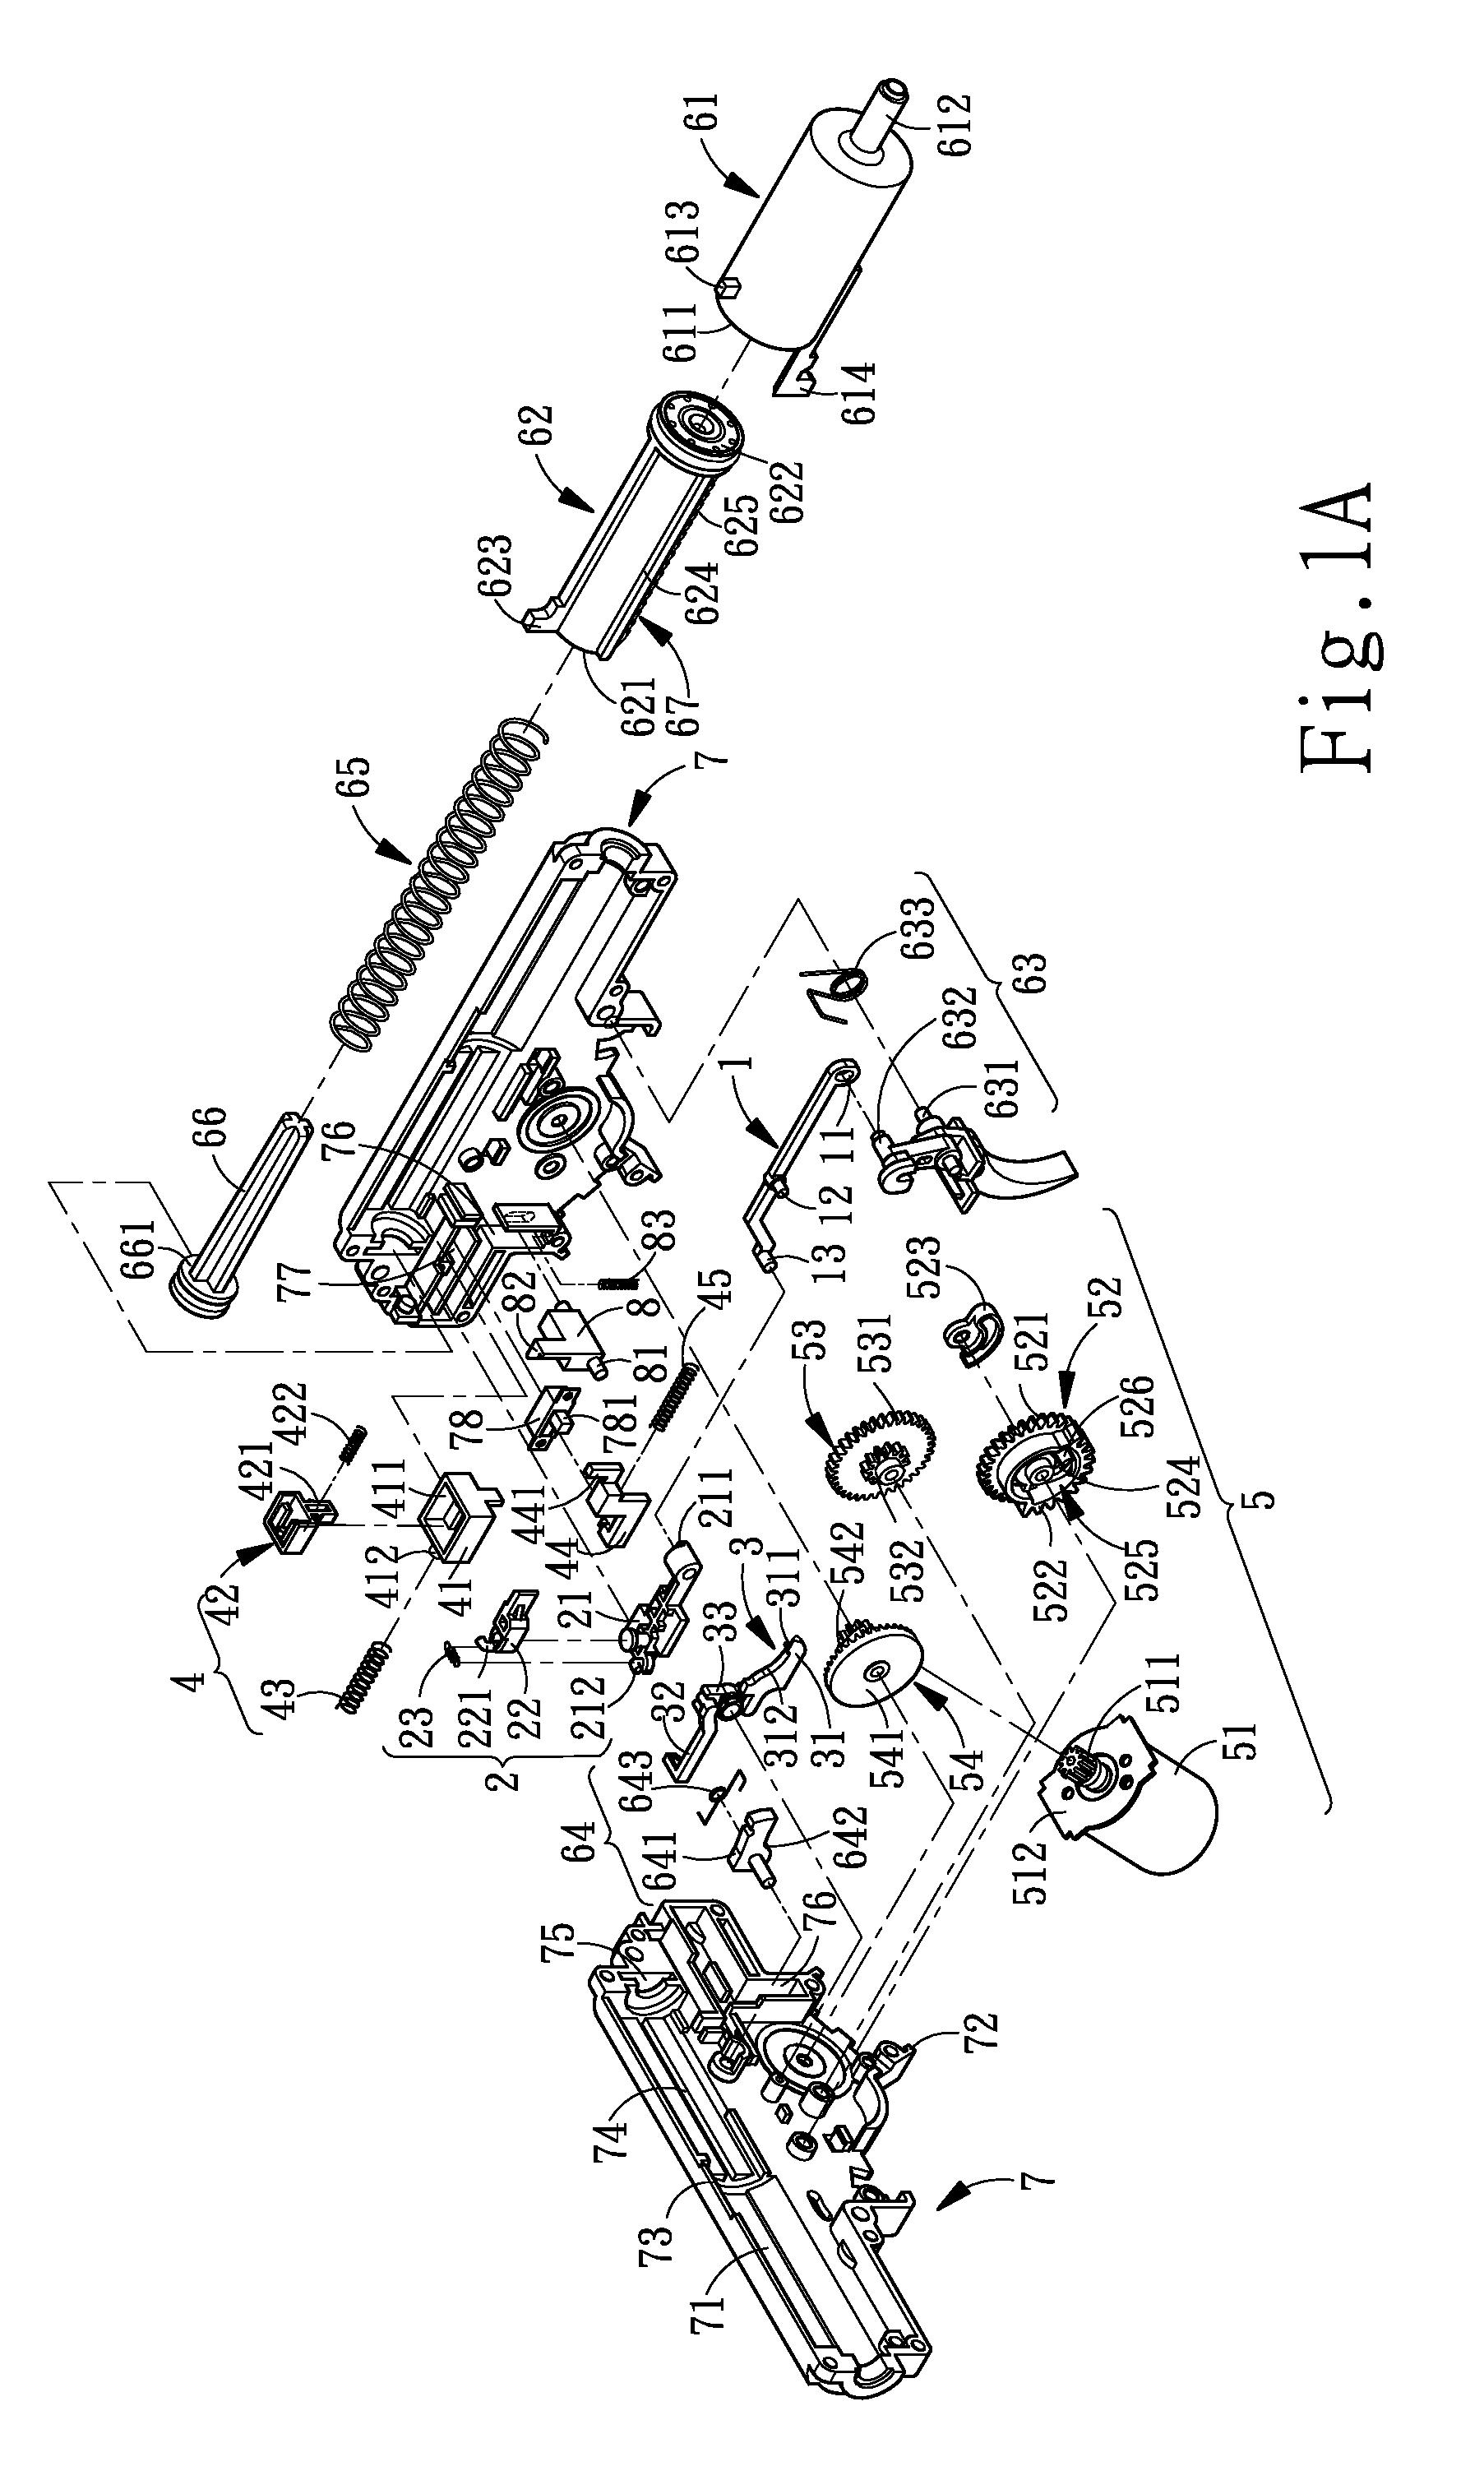 gm vats wiring diagram